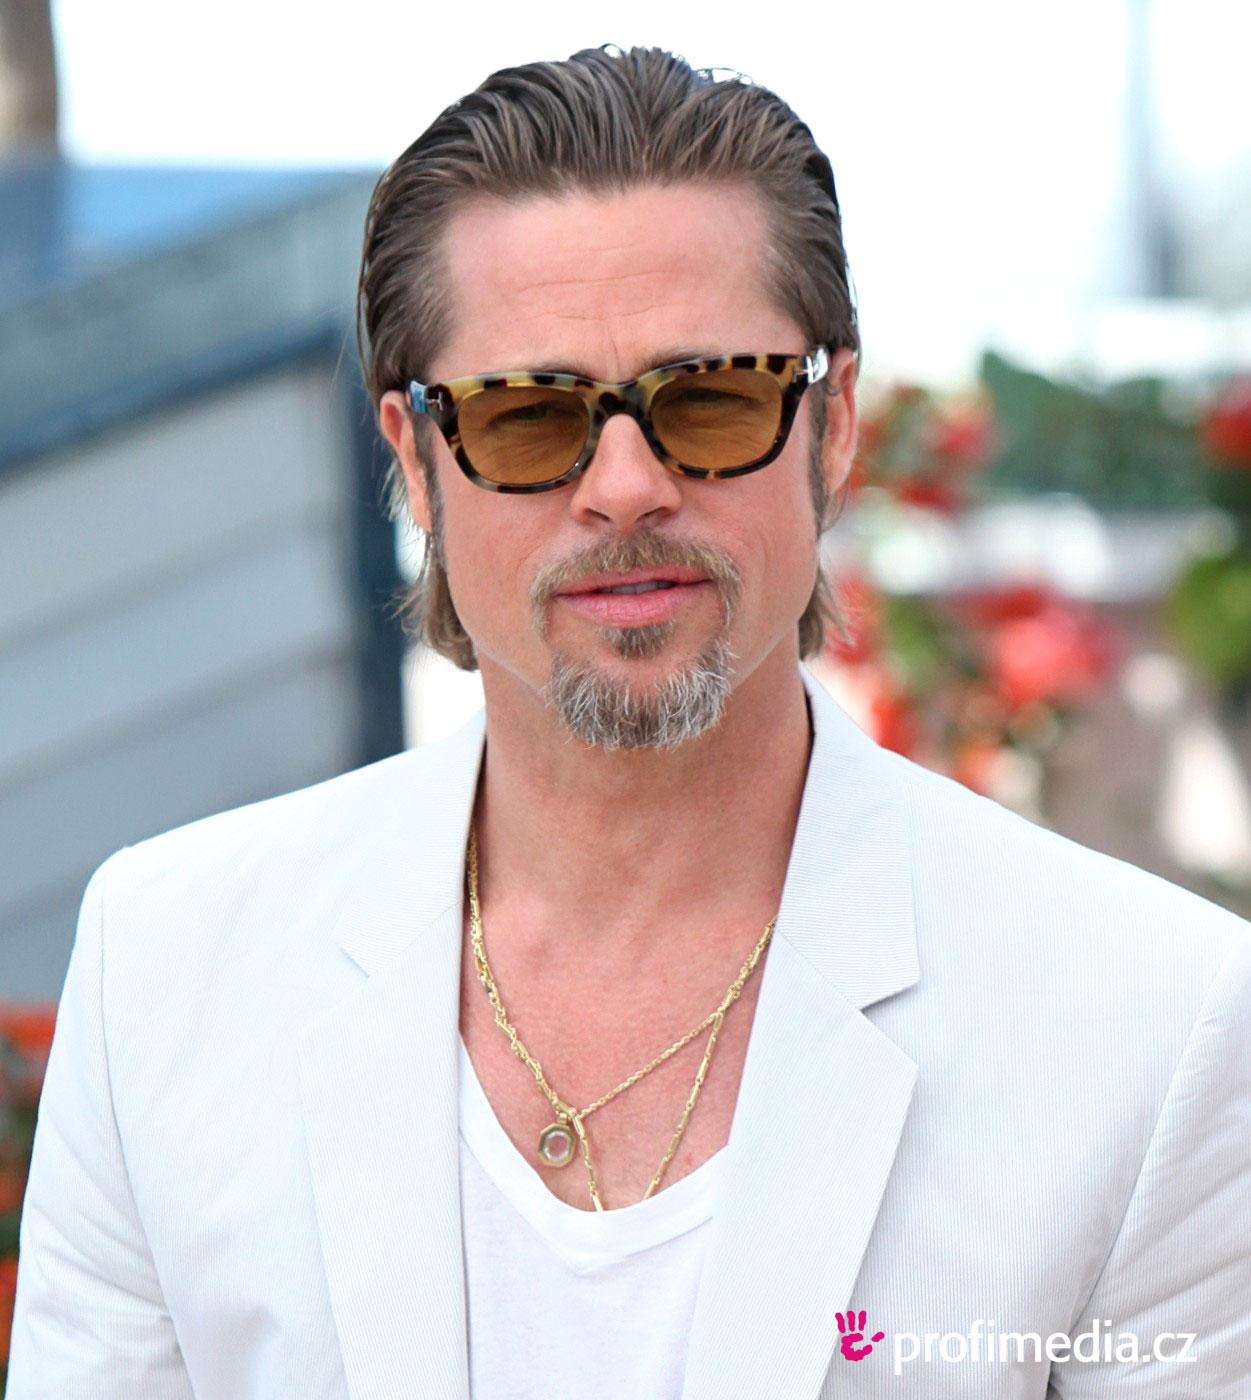 Brad Pitt Frisur